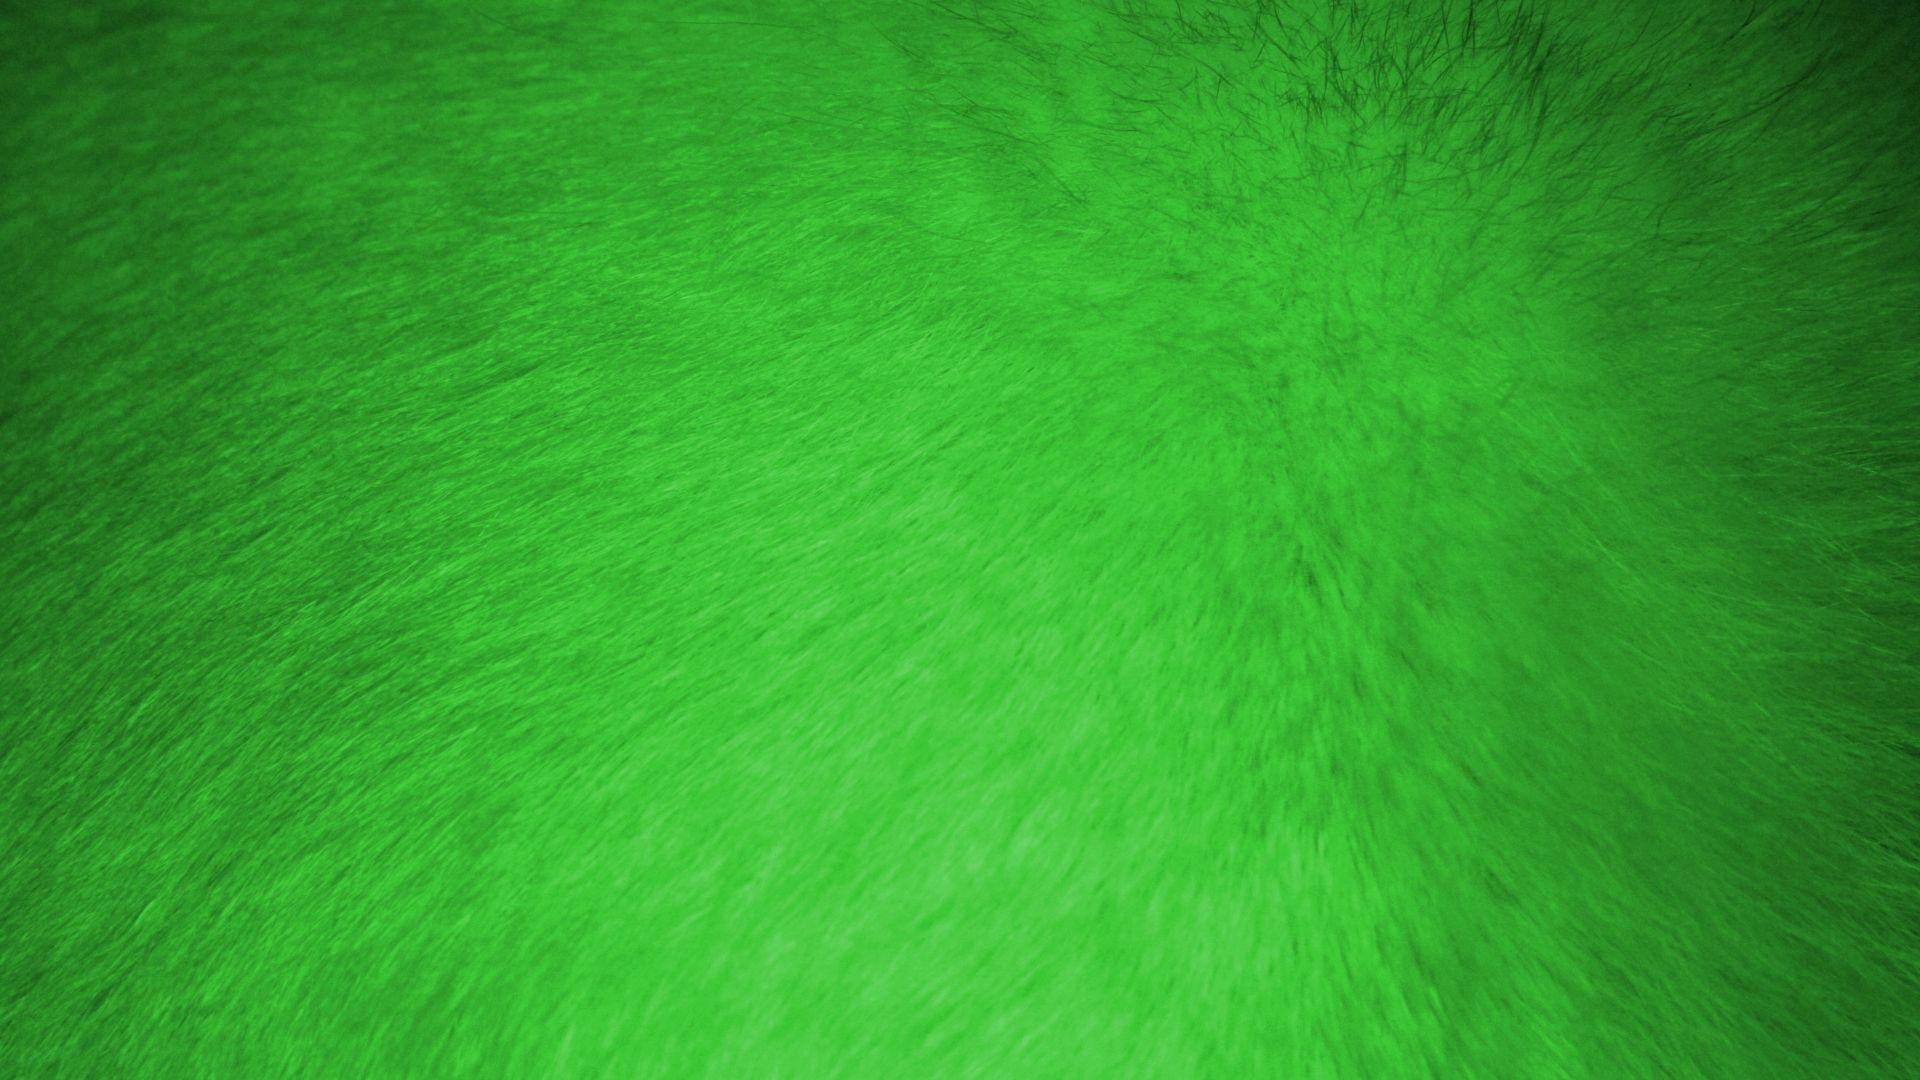 Neon Green good wallpaper